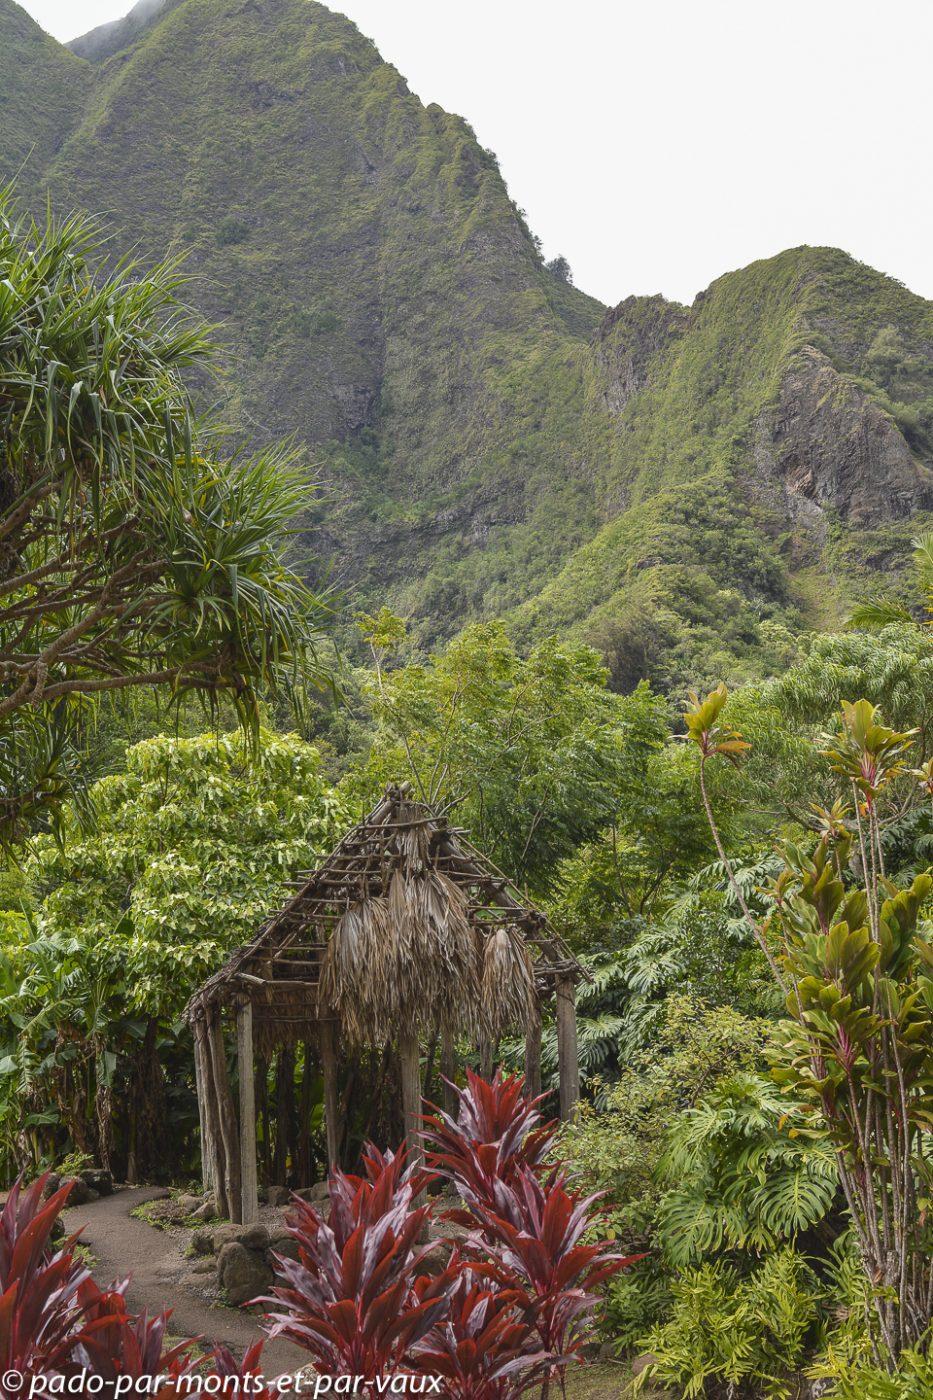 Maui - Iao Valley state park